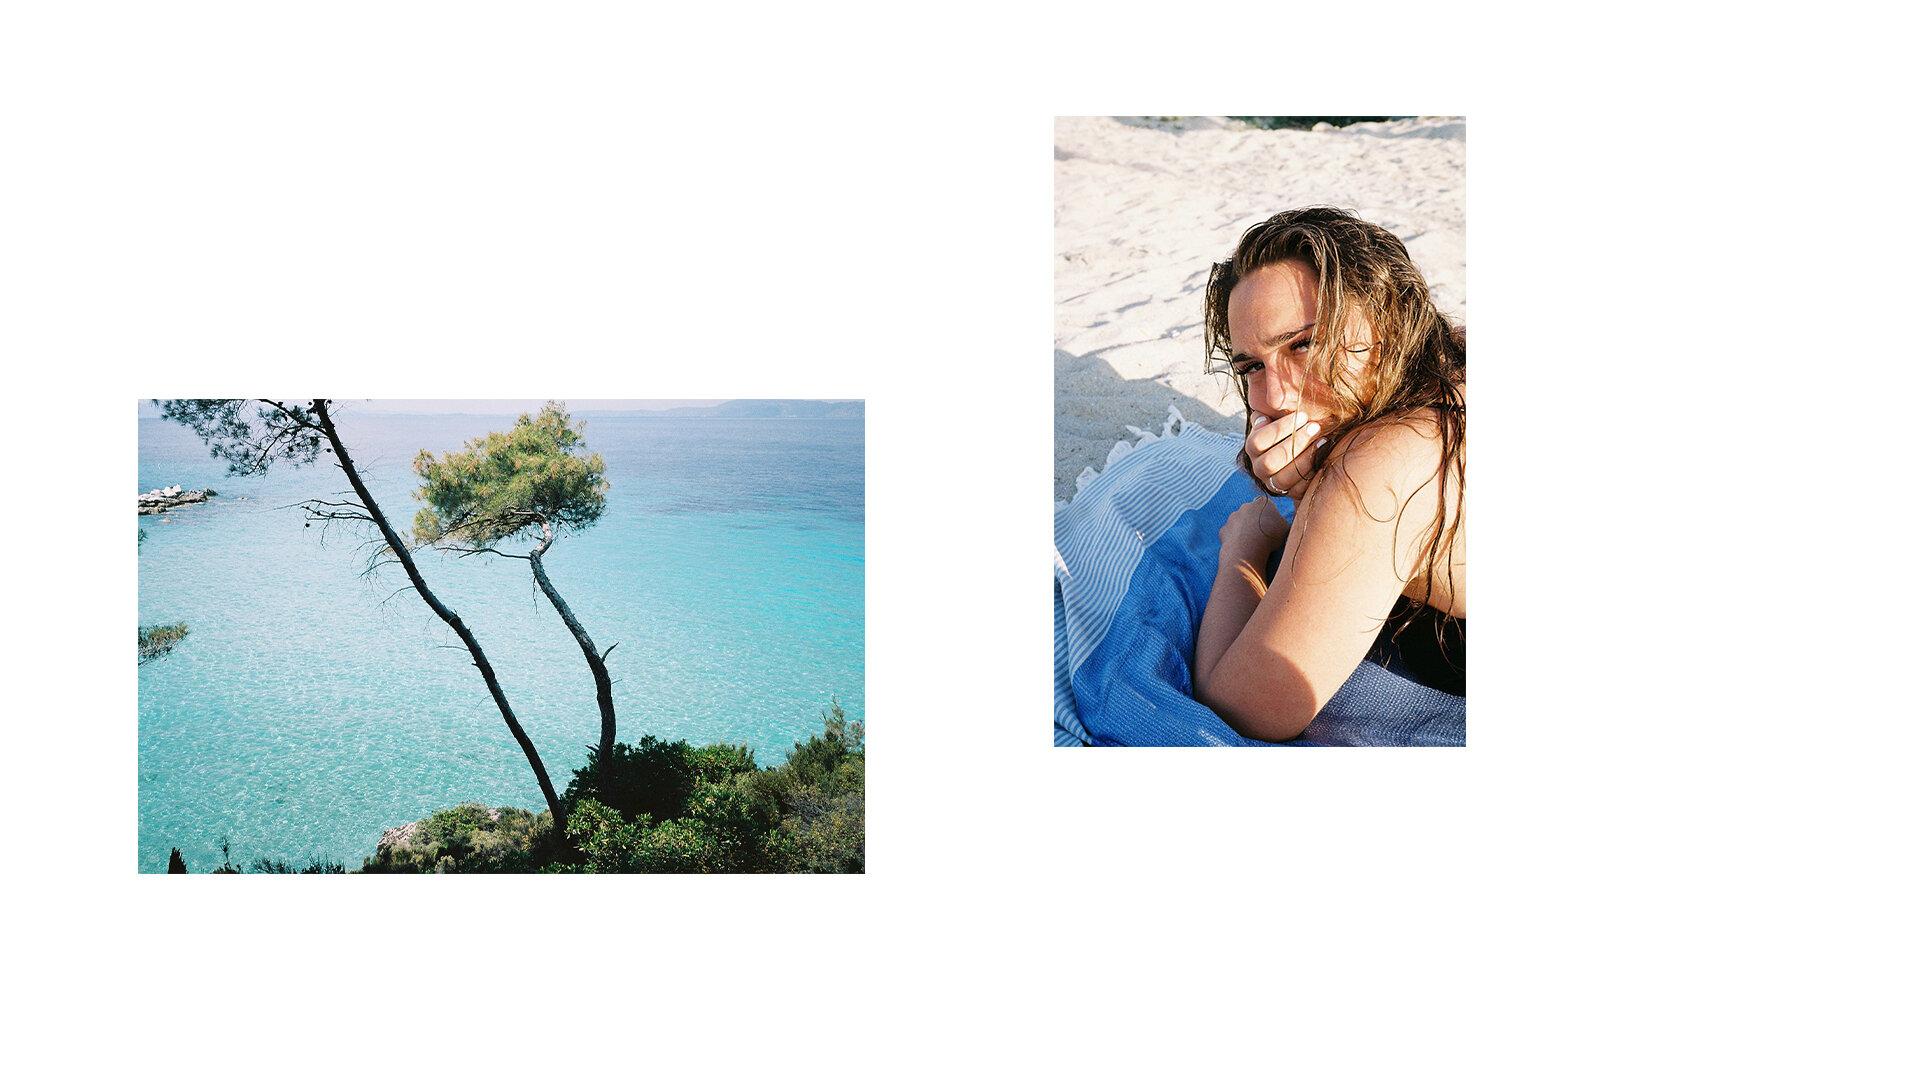 toby-butler-photo-tobybutlerphoto-lifestylephotography-travel-travelphotography-lifestyle-tourism-greece-film-35mm-magazine-europe-mediterranean-ocean-7.jpg